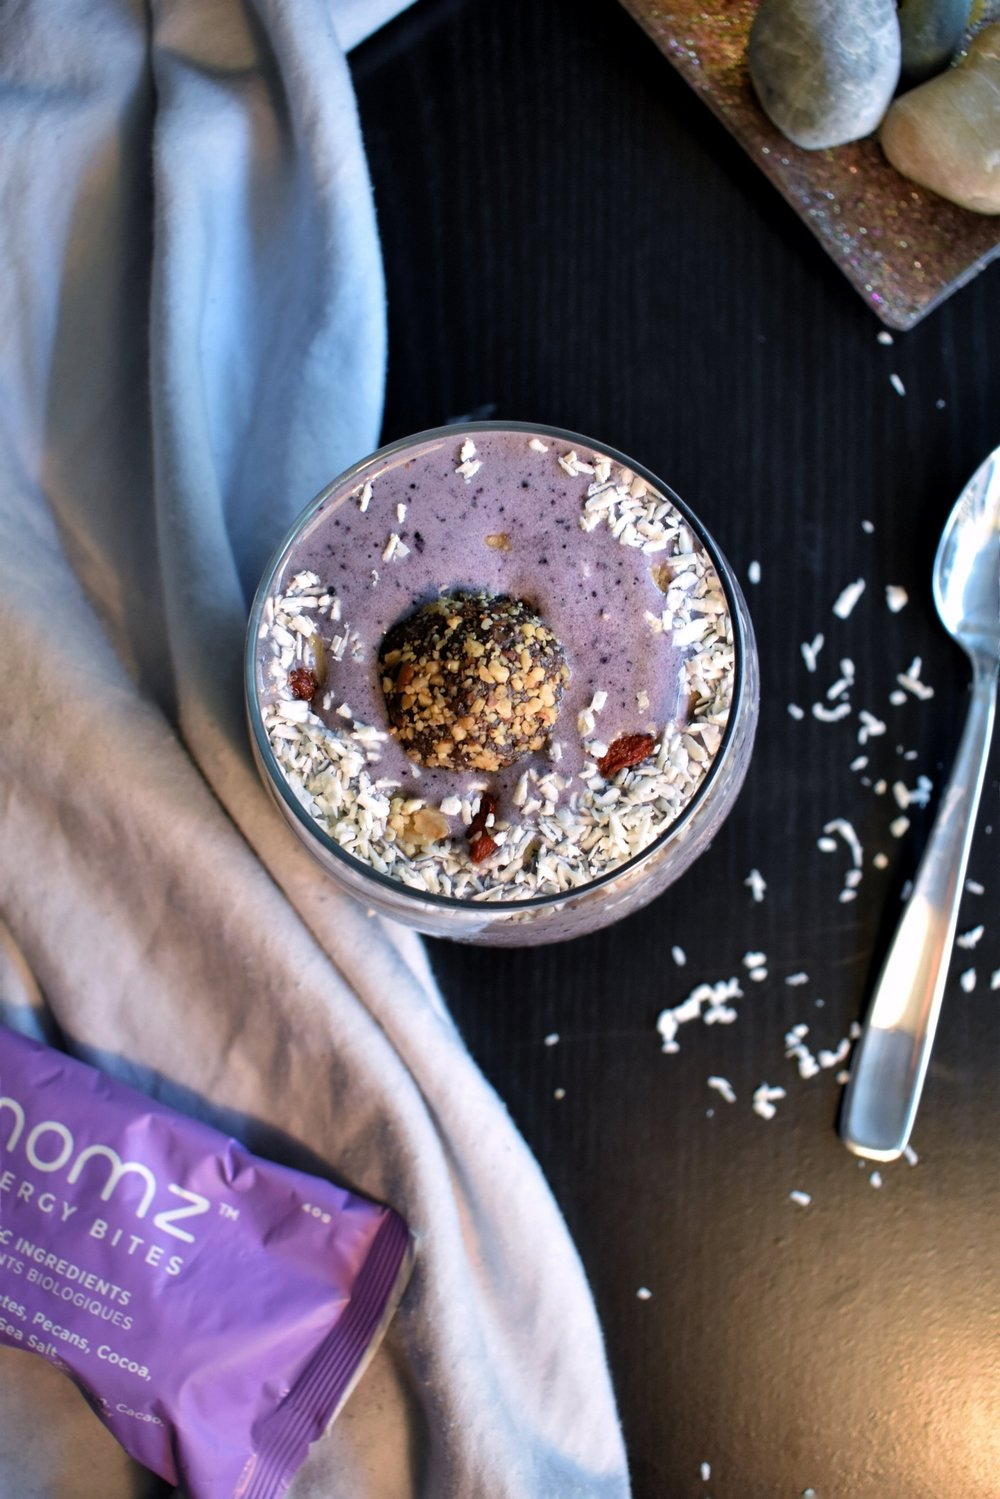 lavender-dreams-smoothie-bliss.jpg